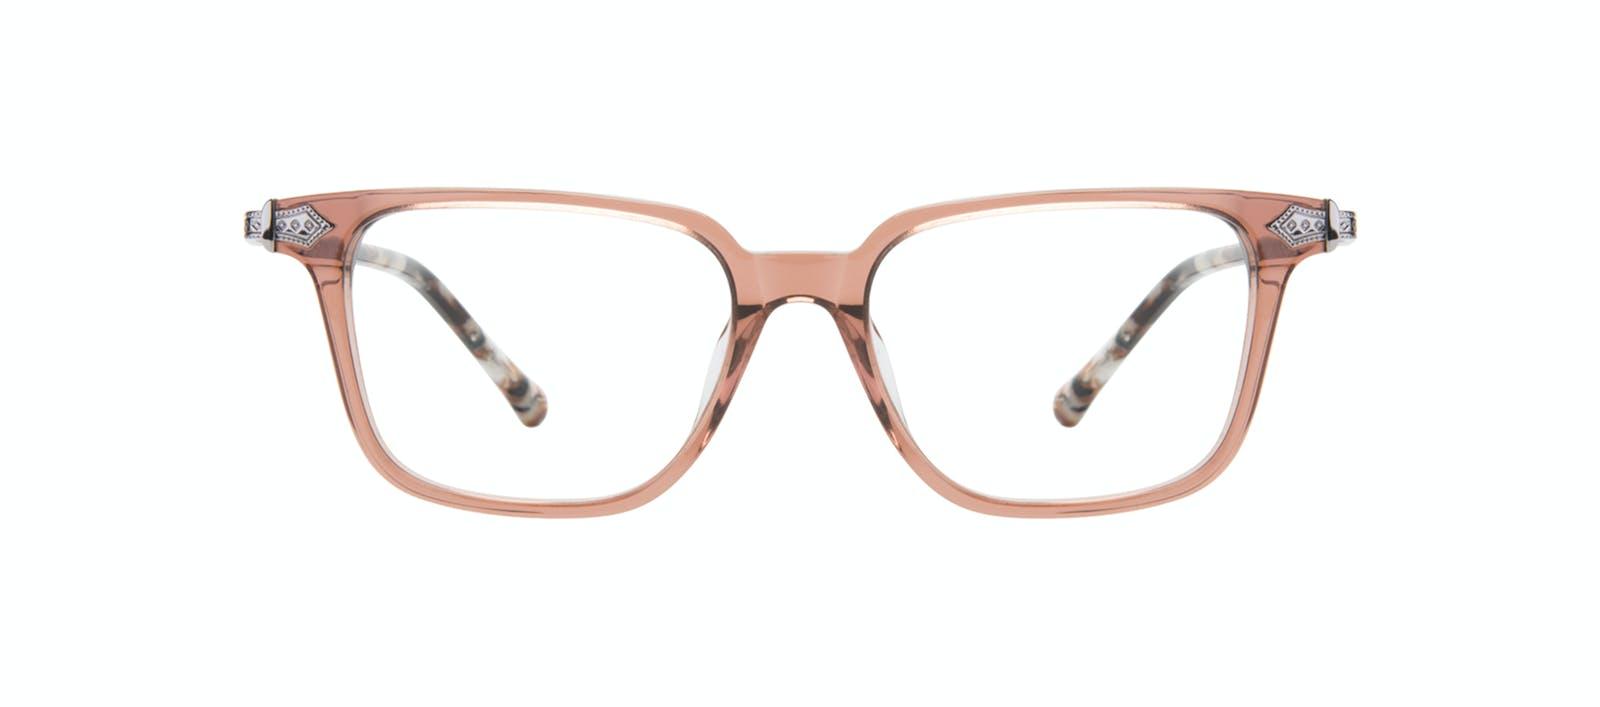 2736bbcb35 Affordable Fashion Glasses Square Eyeglasses Women Twinkle Truffle Rose  Front